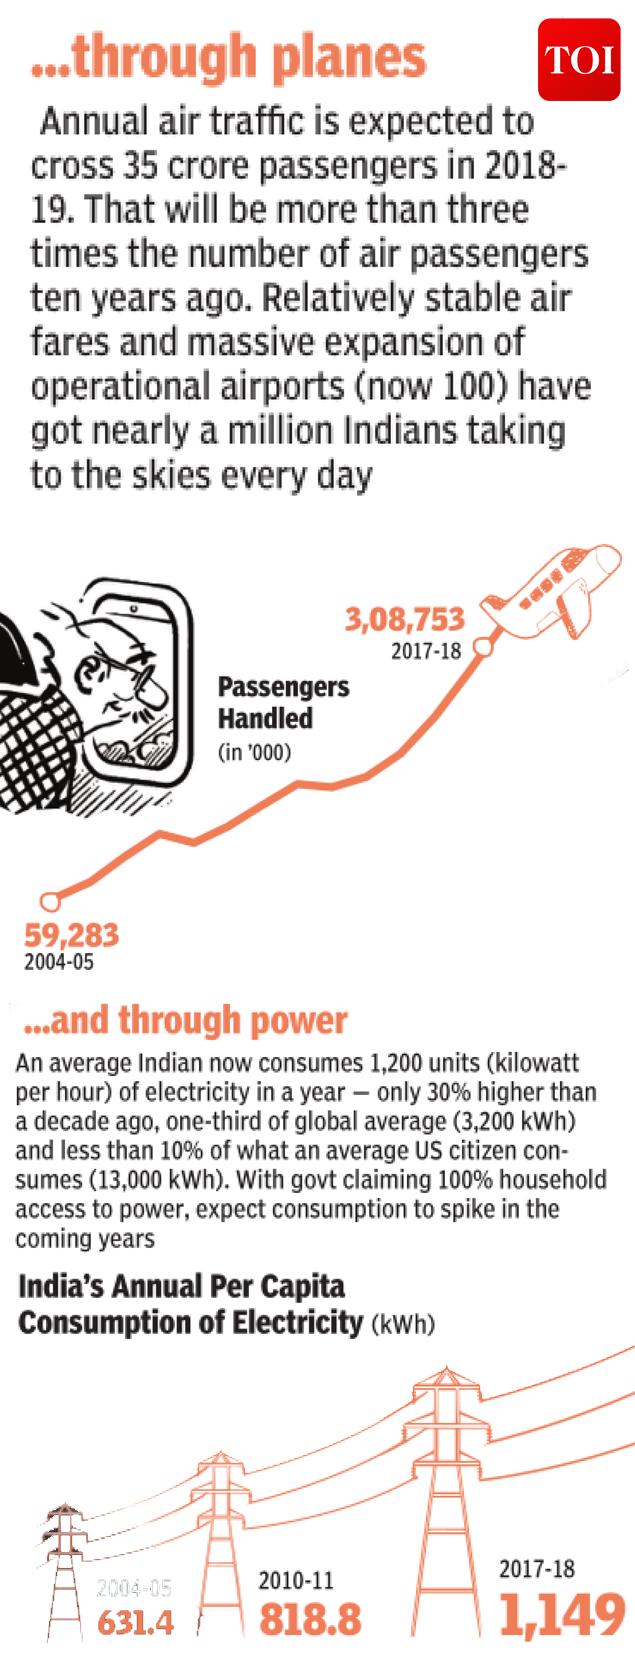 India Annual Per Capita